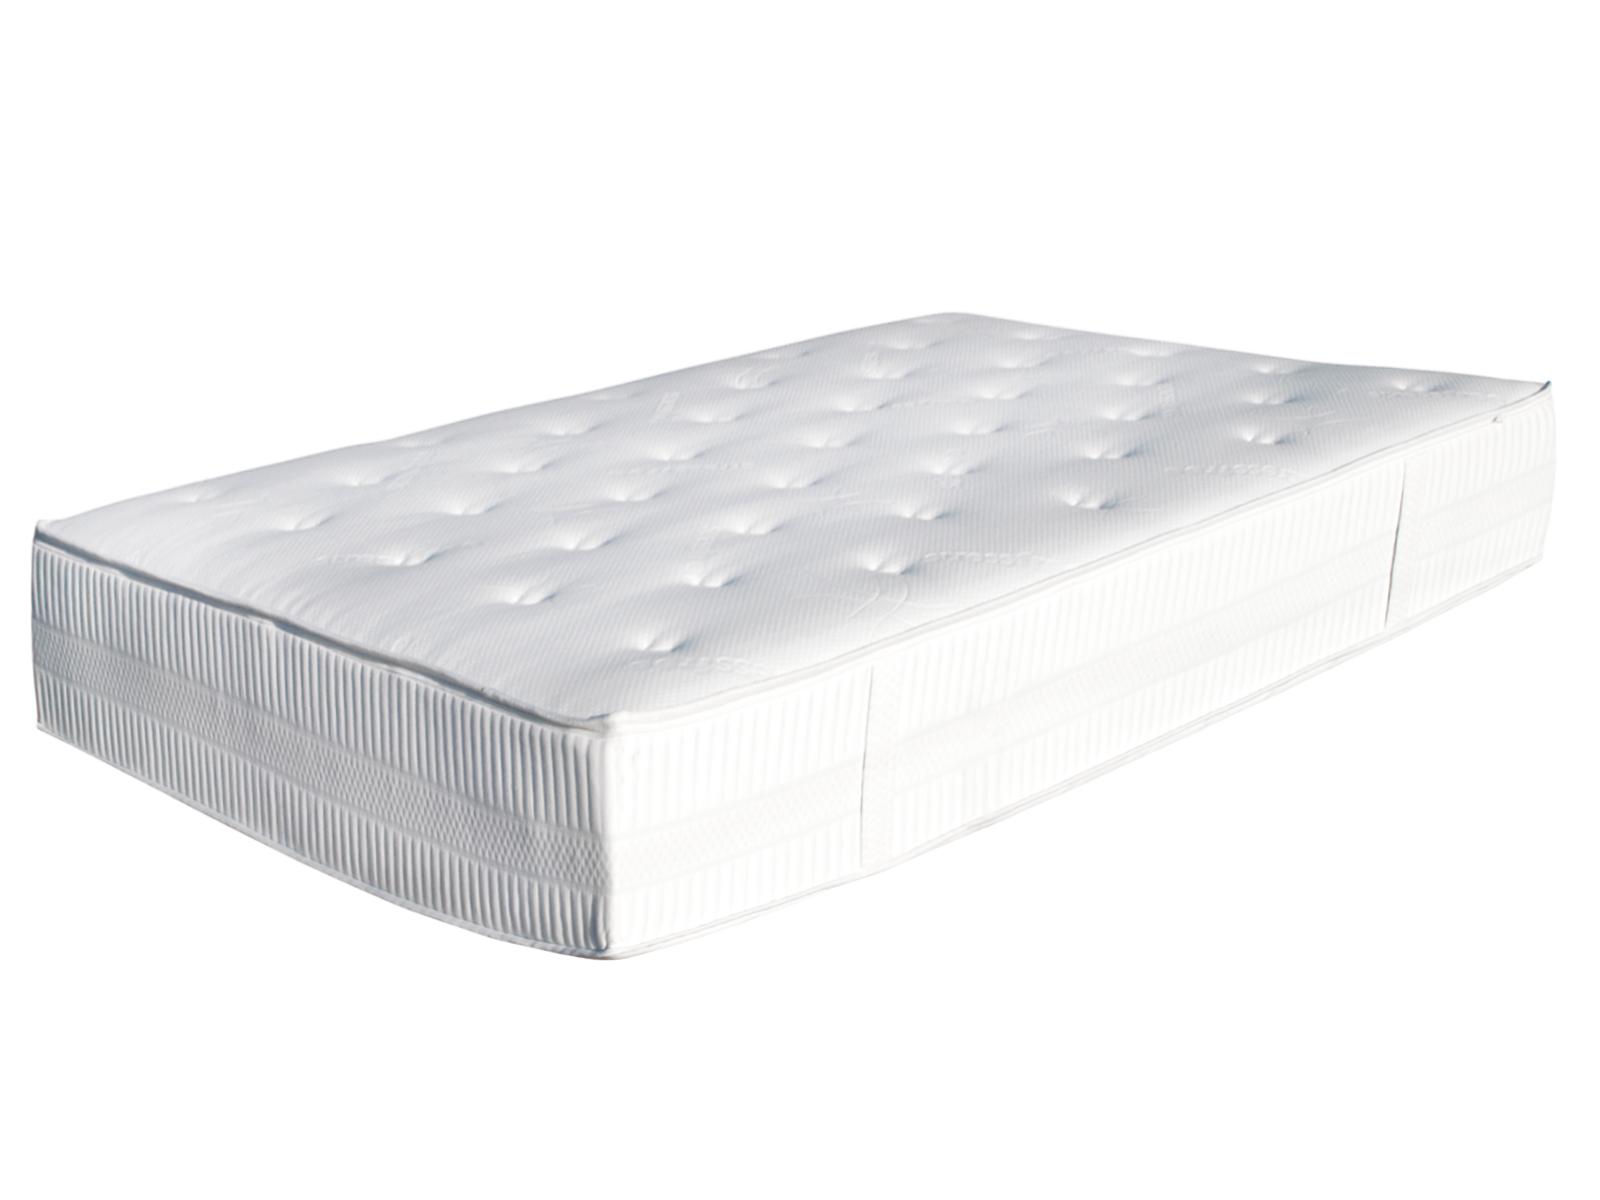 7 zonen boxspringmatratze intermed best 140x200 cm h3 h he 32cm schlafen matratzen. Black Bedroom Furniture Sets. Home Design Ideas